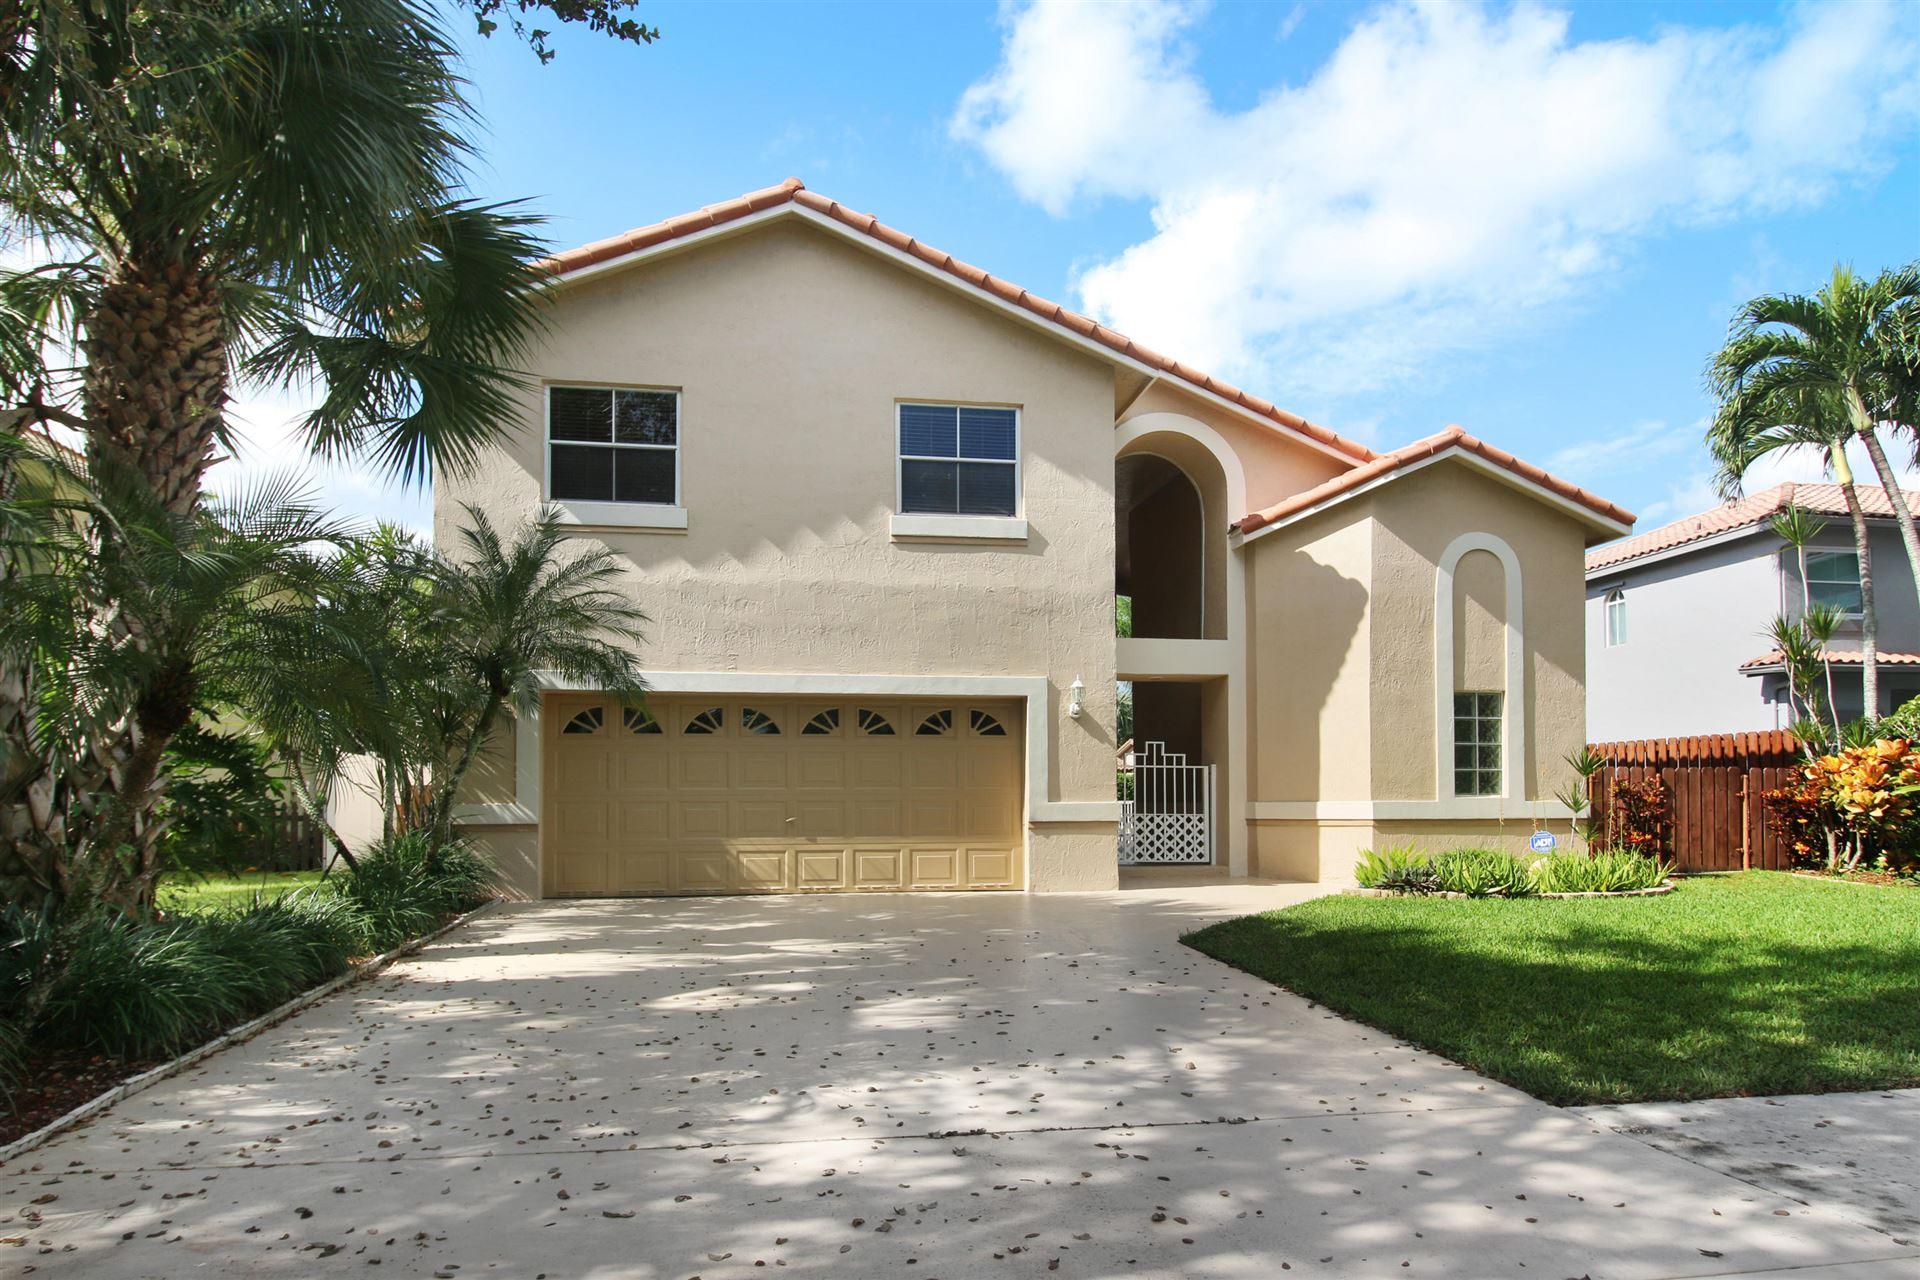 Photo of 6331 NW 58th Way, Parkland, FL 33067 (MLS # RX-10664691)